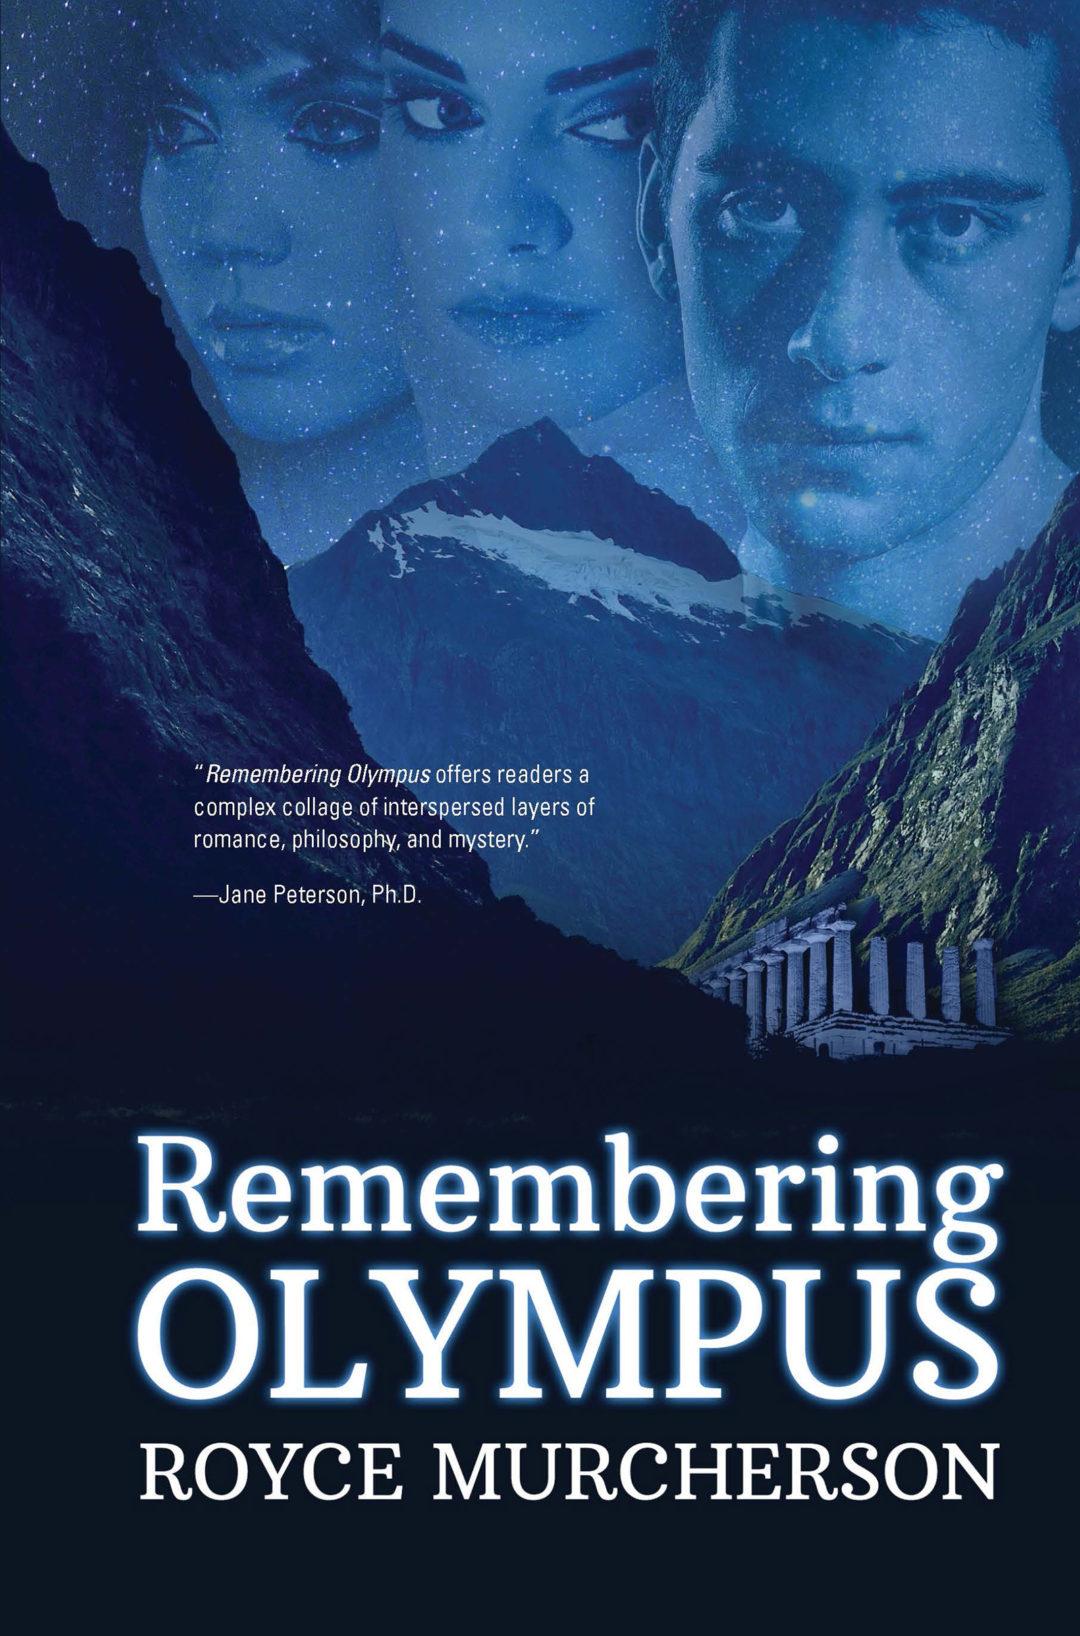 Remembering Olympus